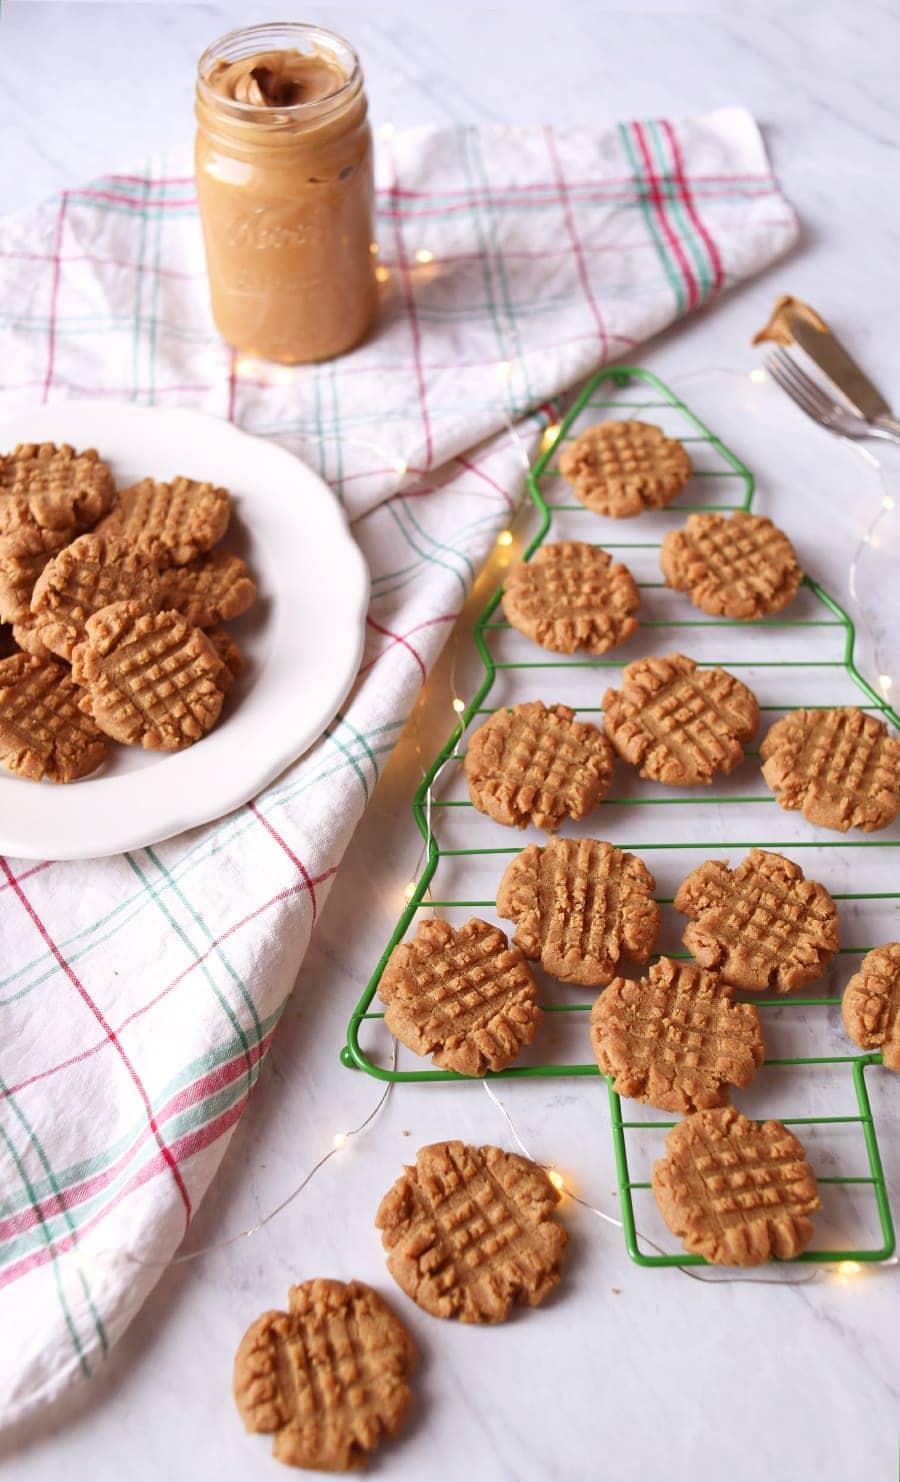 Vegan Peanut Butter Cookies 7270 Web - Vegan Peanut Butter Cookies- Crispy Outside, Chewy Inside!